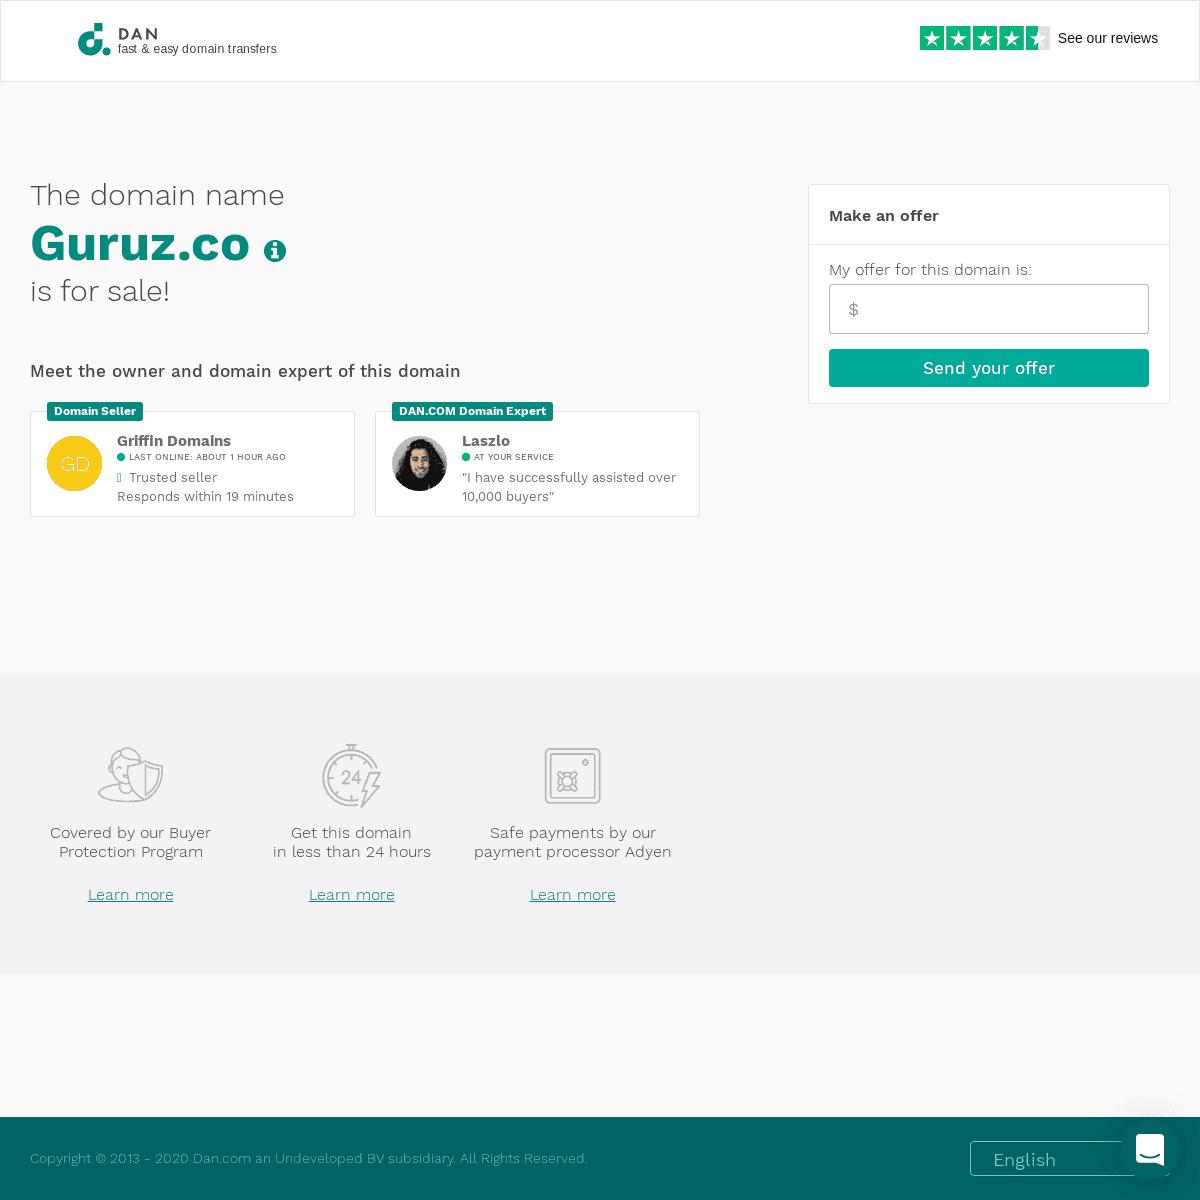 The domain name Guruz.co is for sale